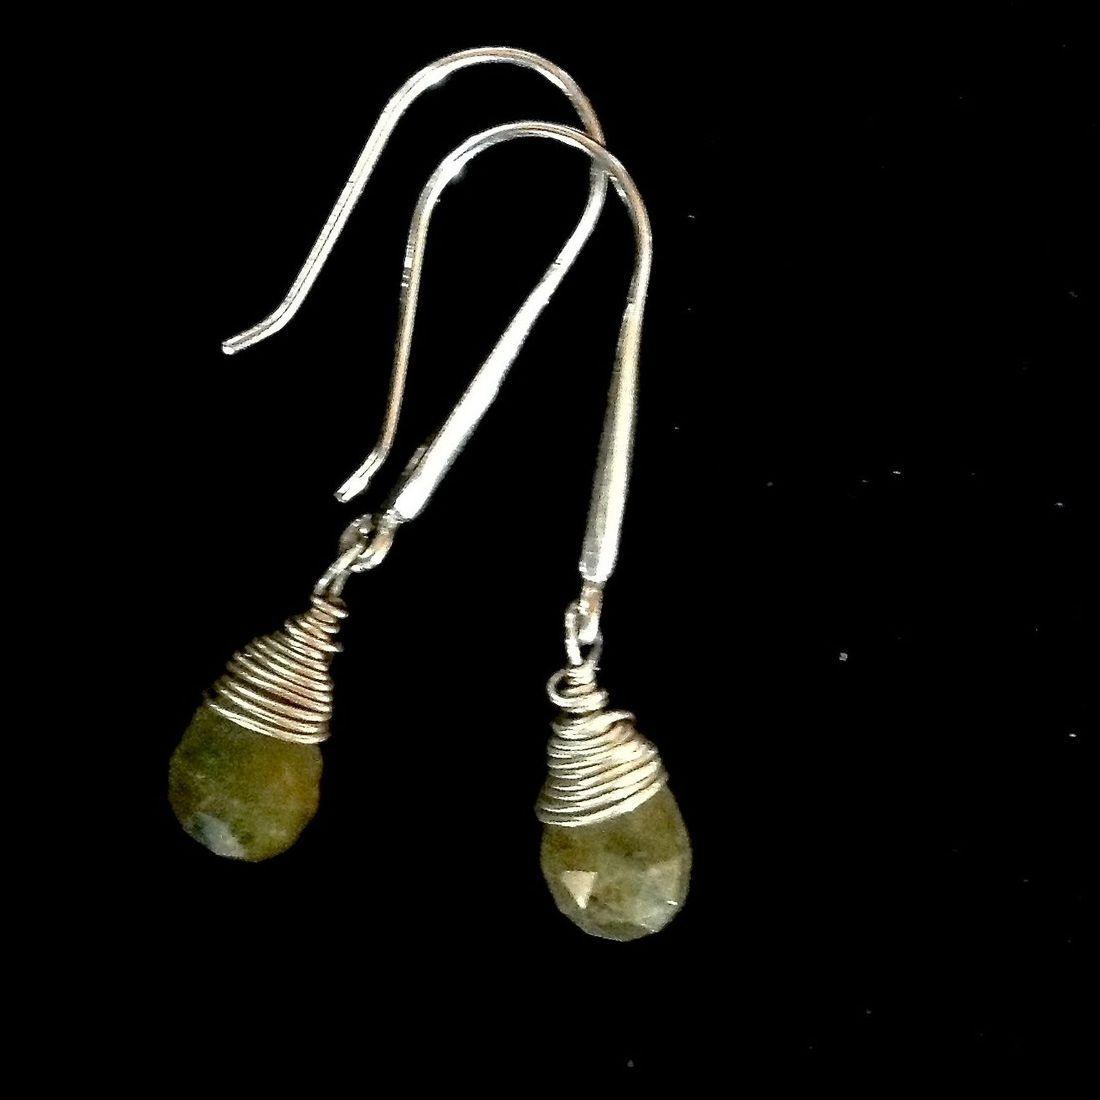 Green Garnet Gemstone earrings on Sterling hooks